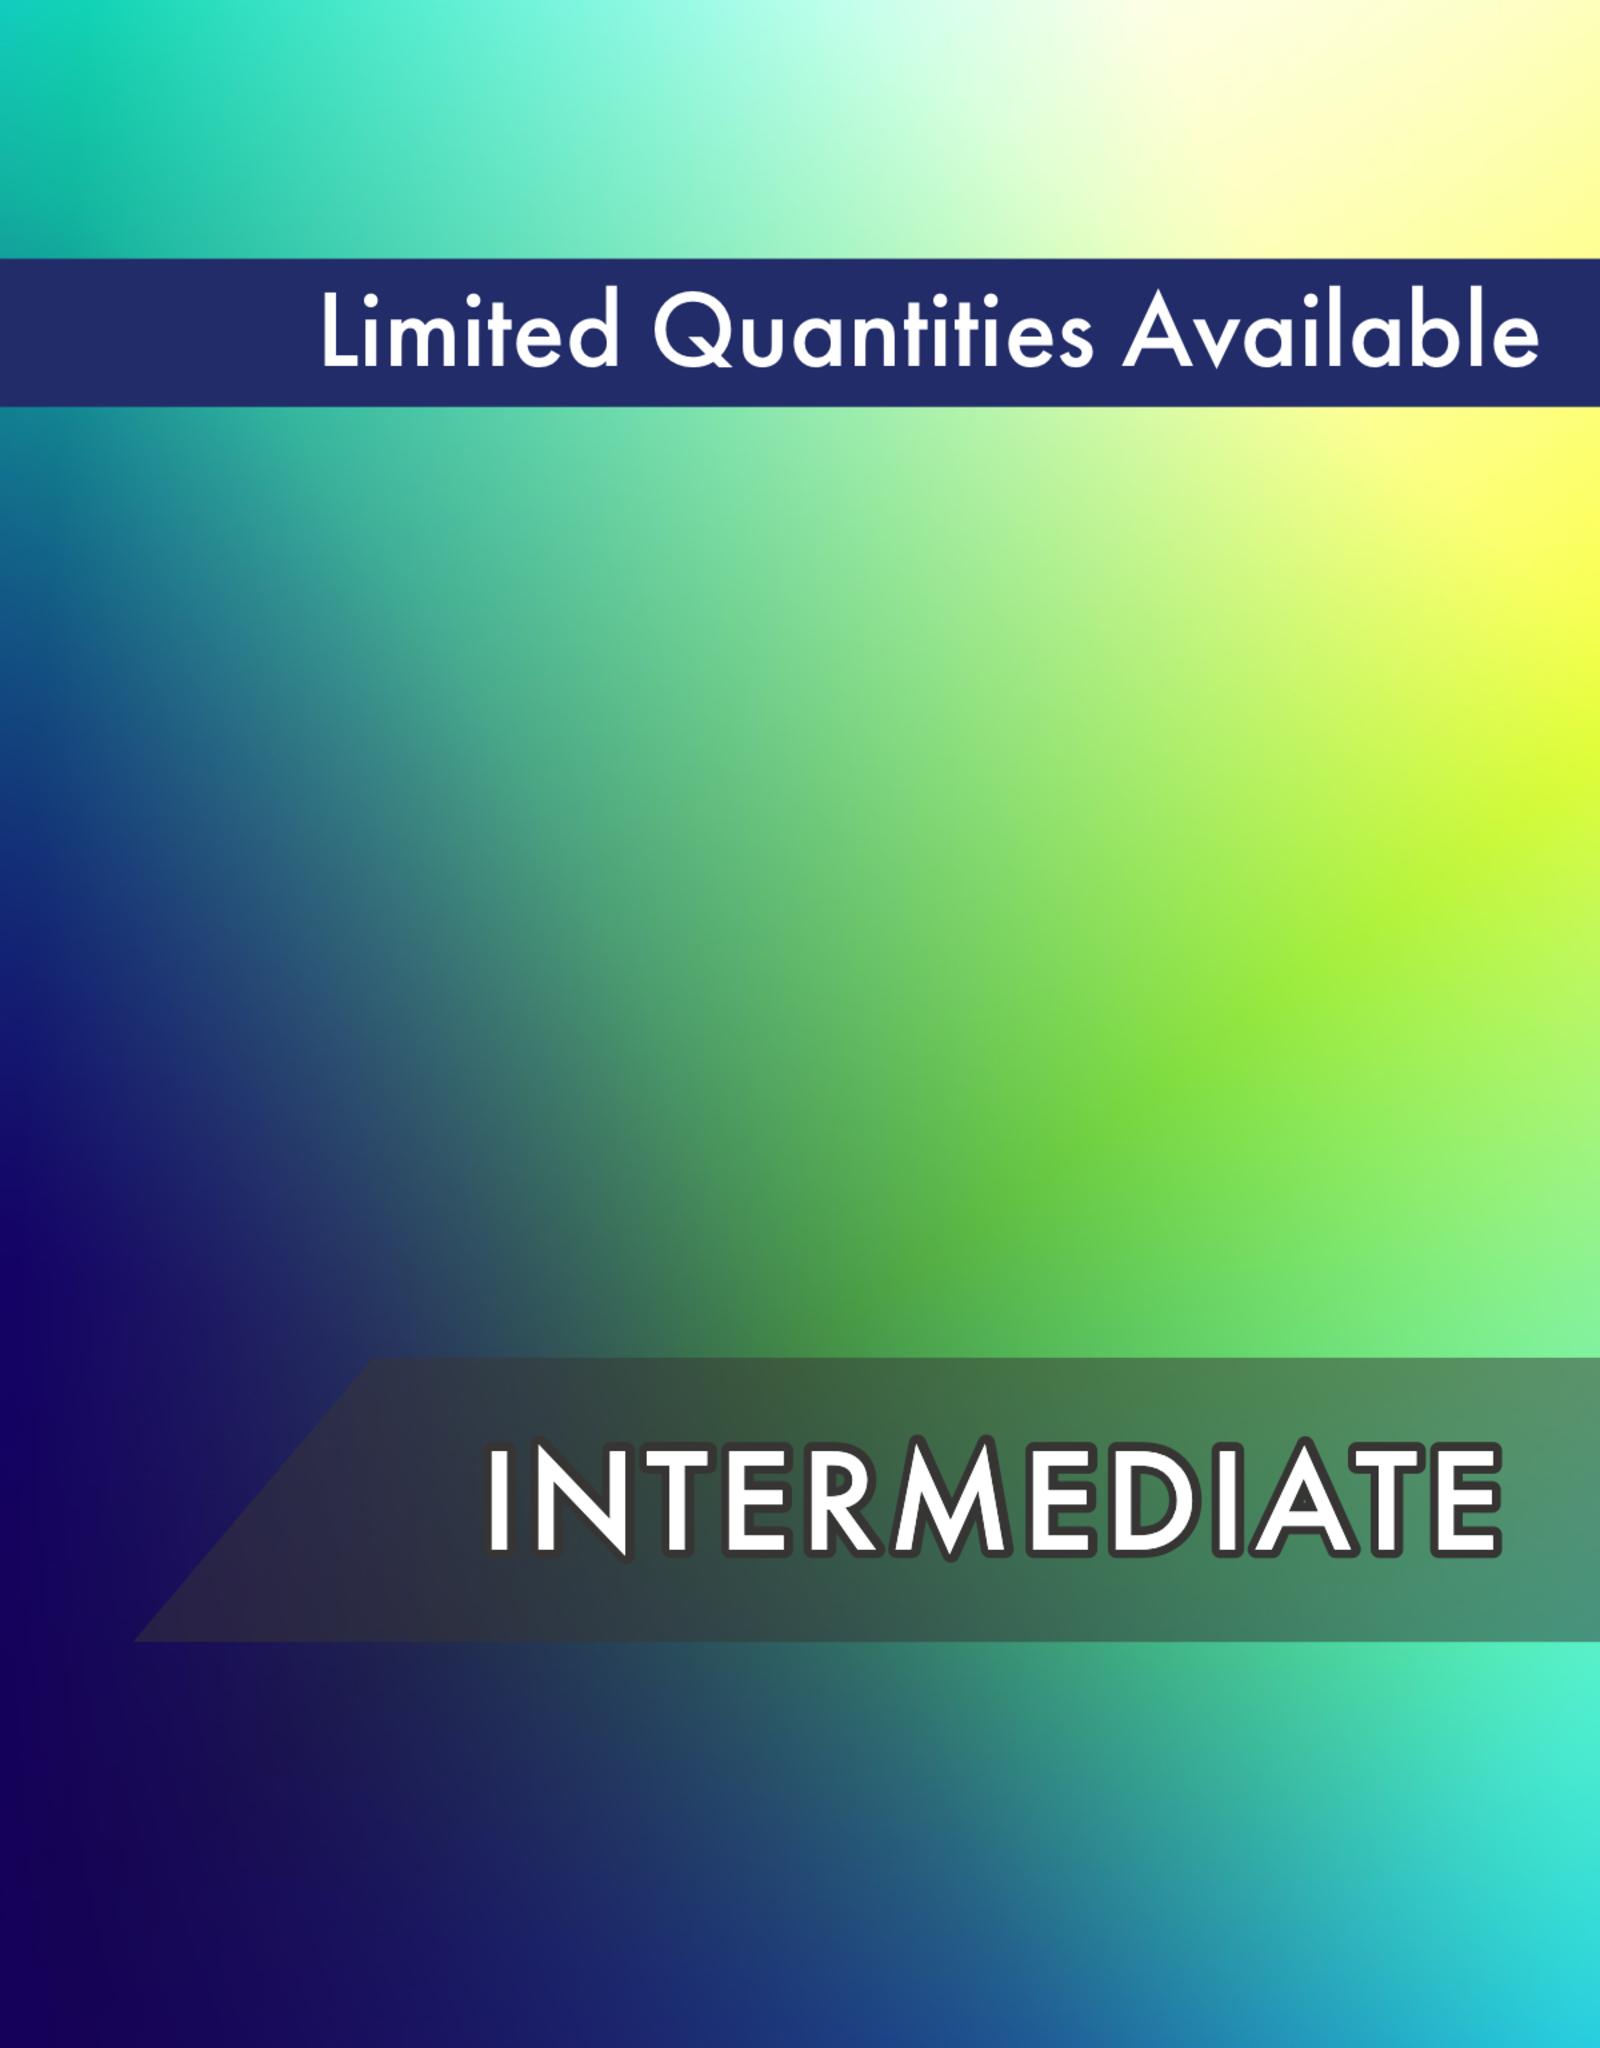 2021 Intermediate Membership Deposit